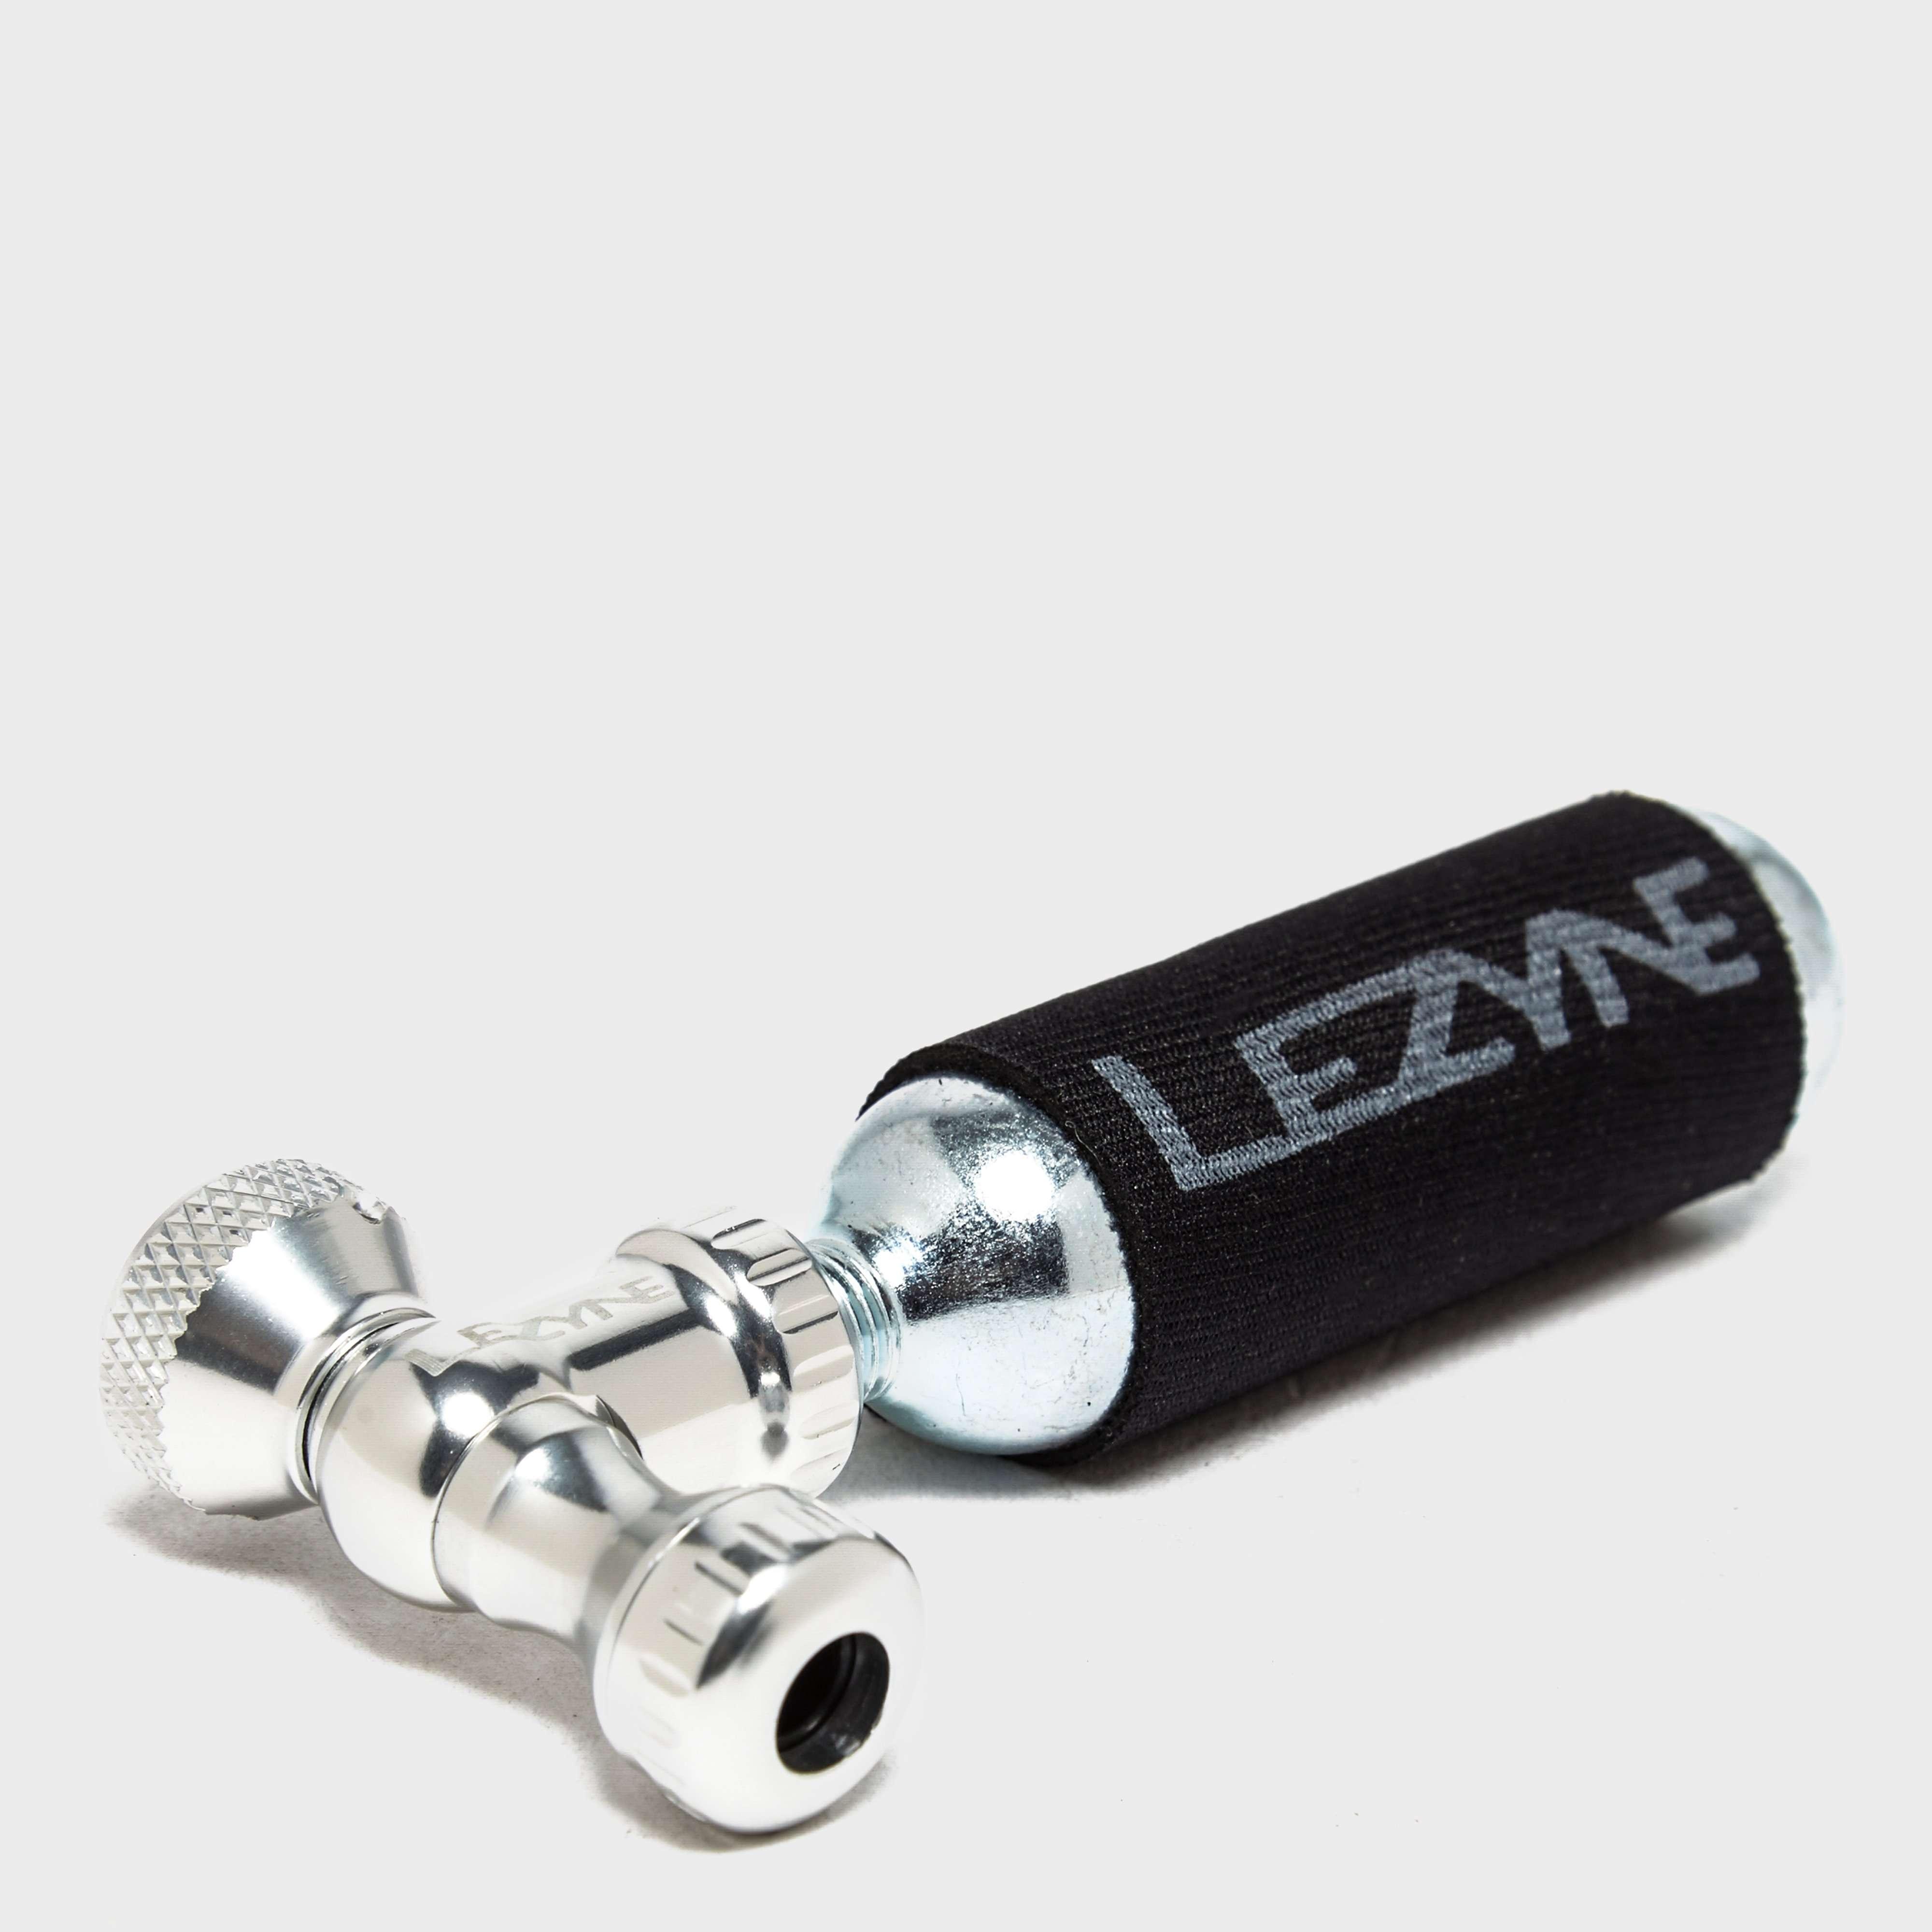 LEZYNE Control Drive CO2 Inflator